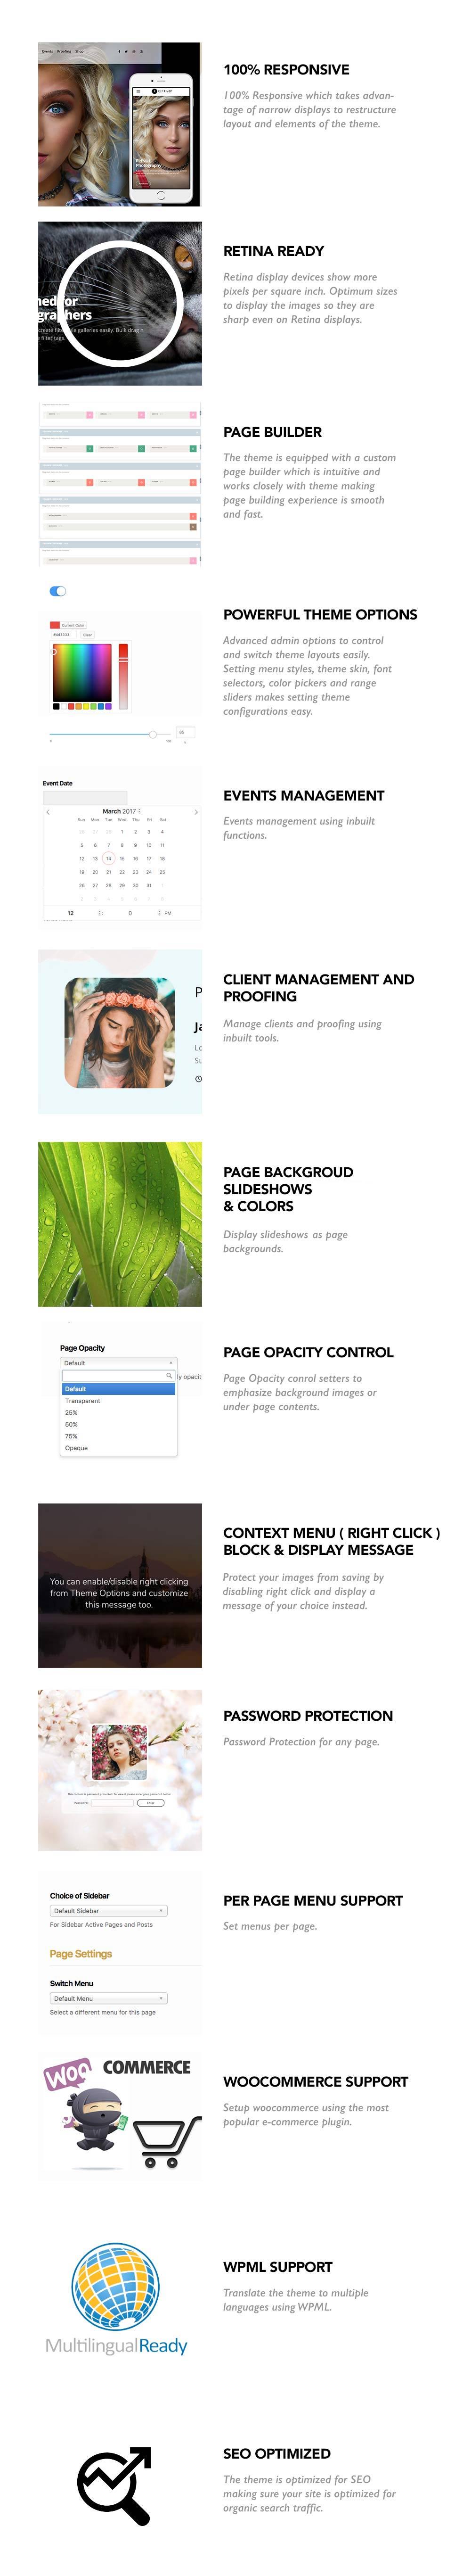 showcase Refrakt   Photography Theme for WordPress Nulled Free Download showcase6 2